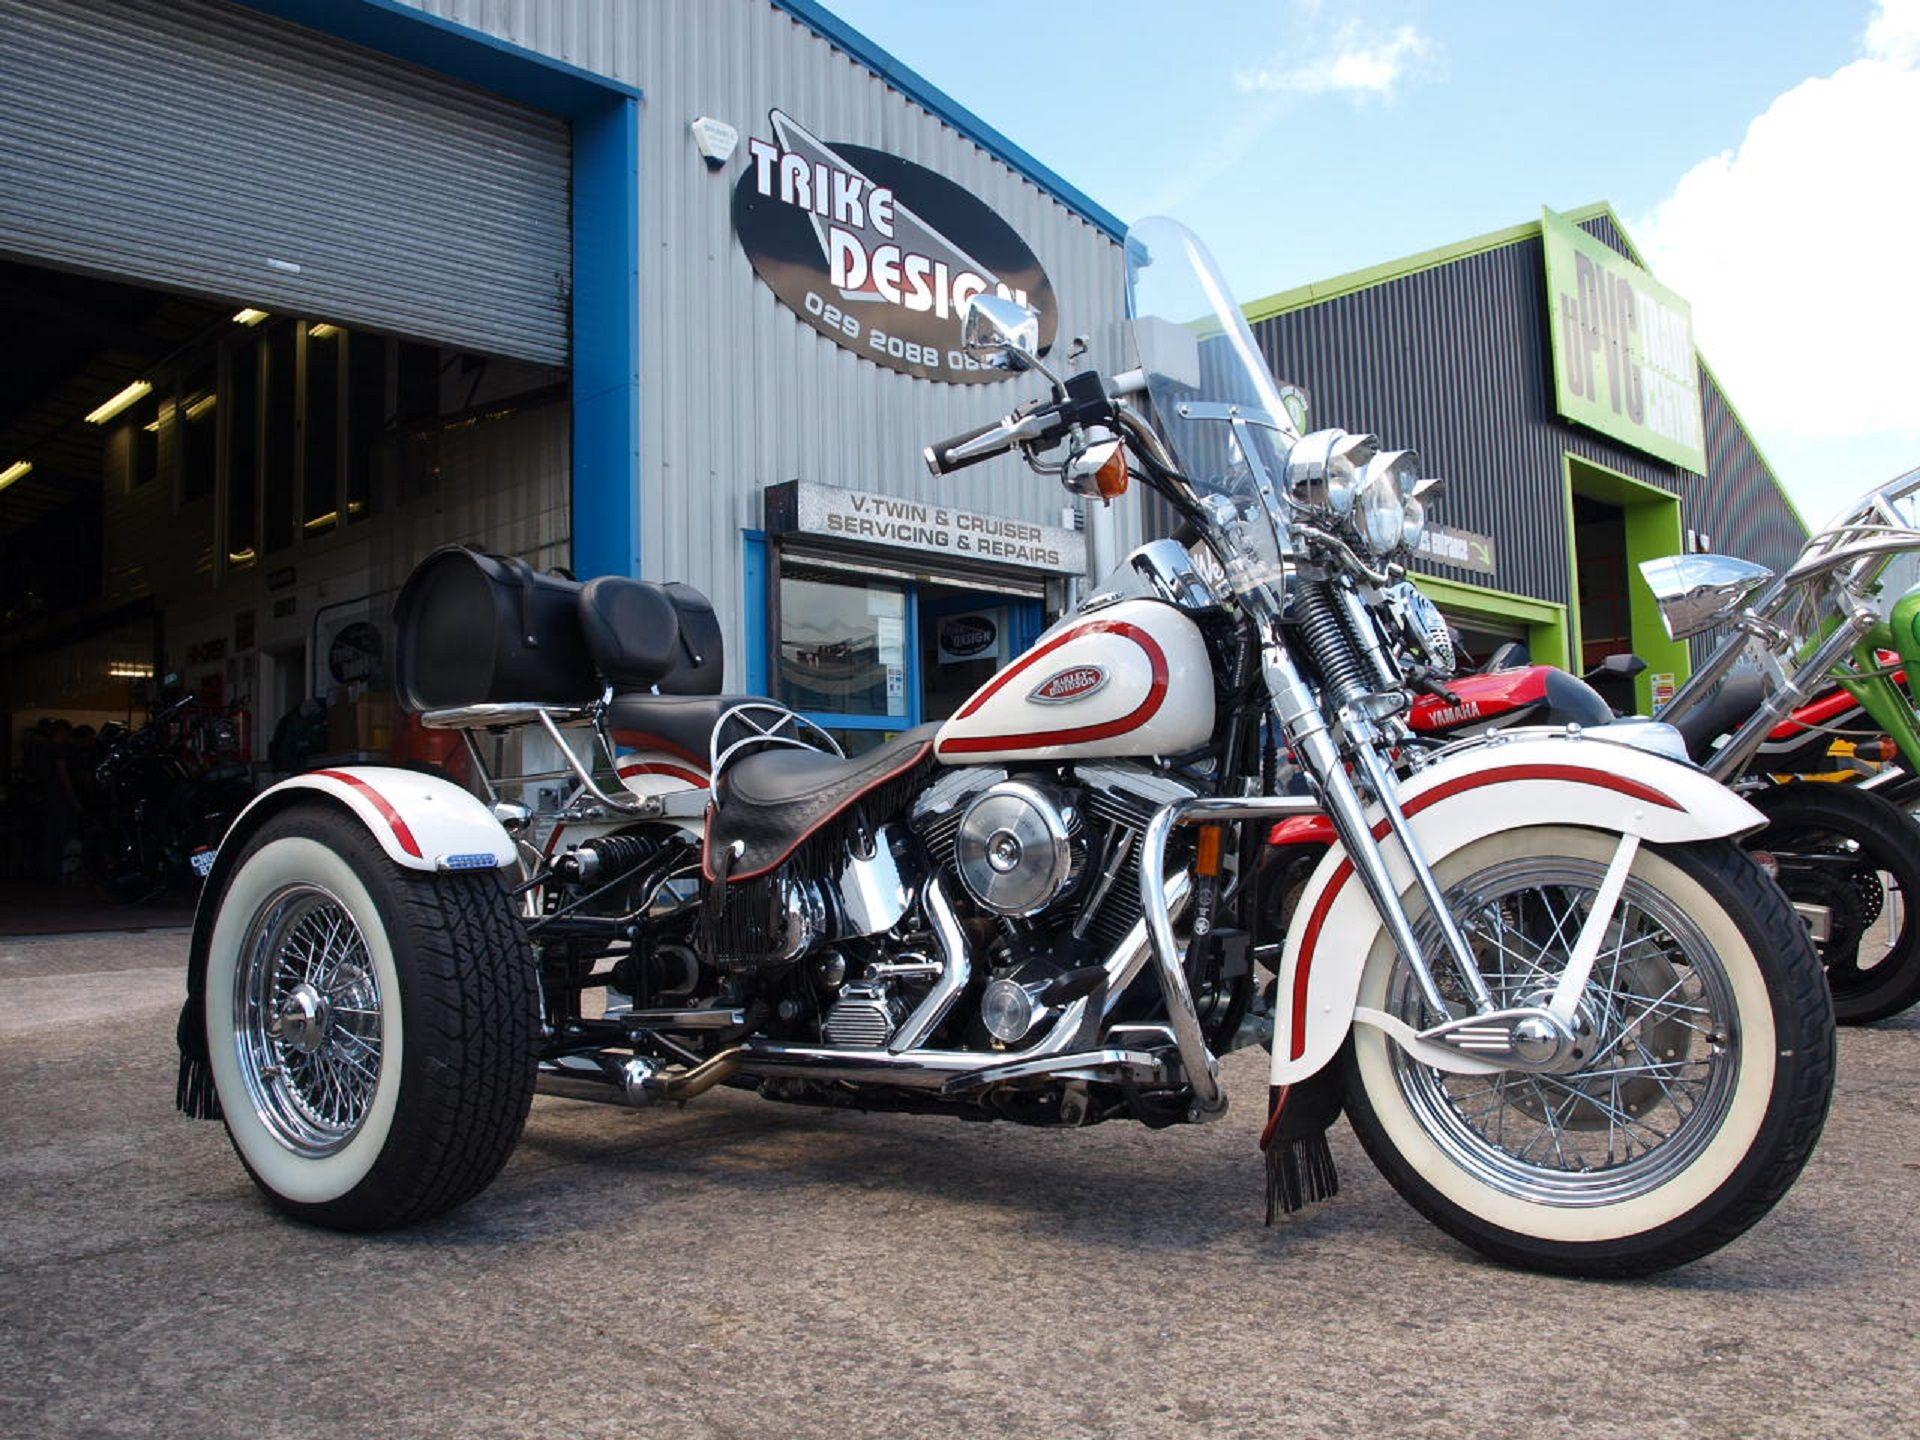 Harley Heritage Springer Trike. http//trikedesign.co.uk